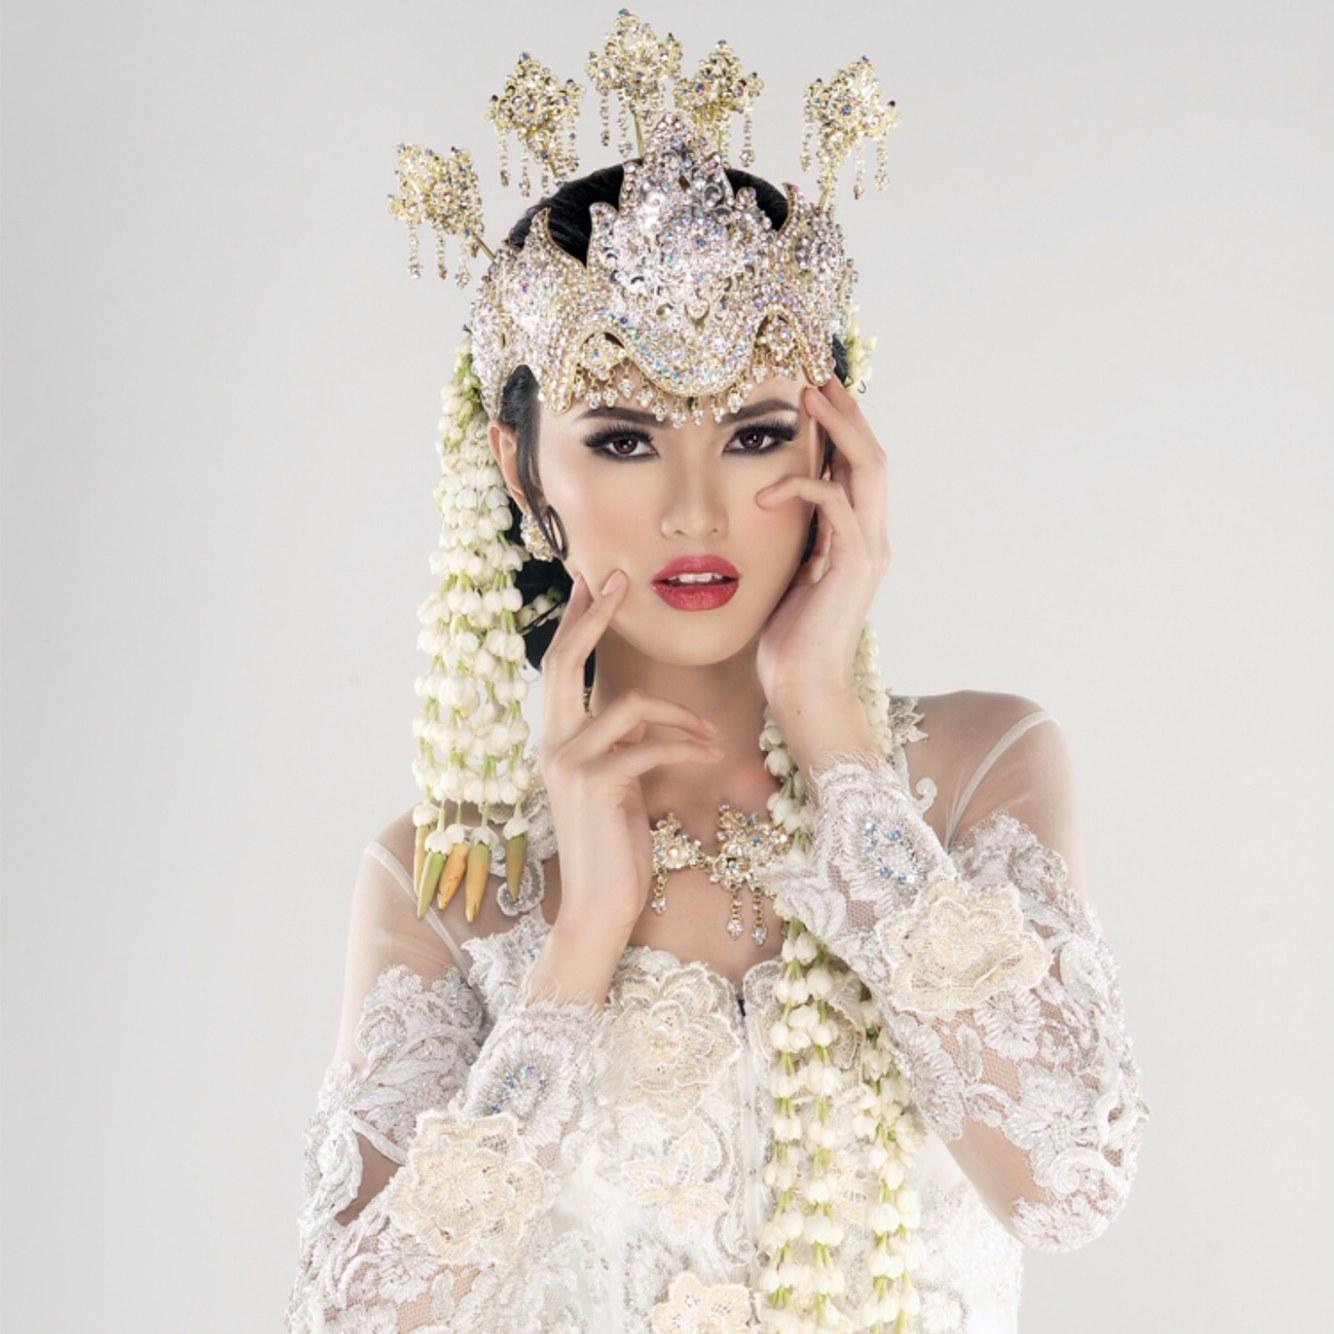 Inspirasi Gaun Pengantin Adat Sunda Muslim U3dh Cantik Ini Dia Pakaian Pengantin Adat Sunda Yang Elegan